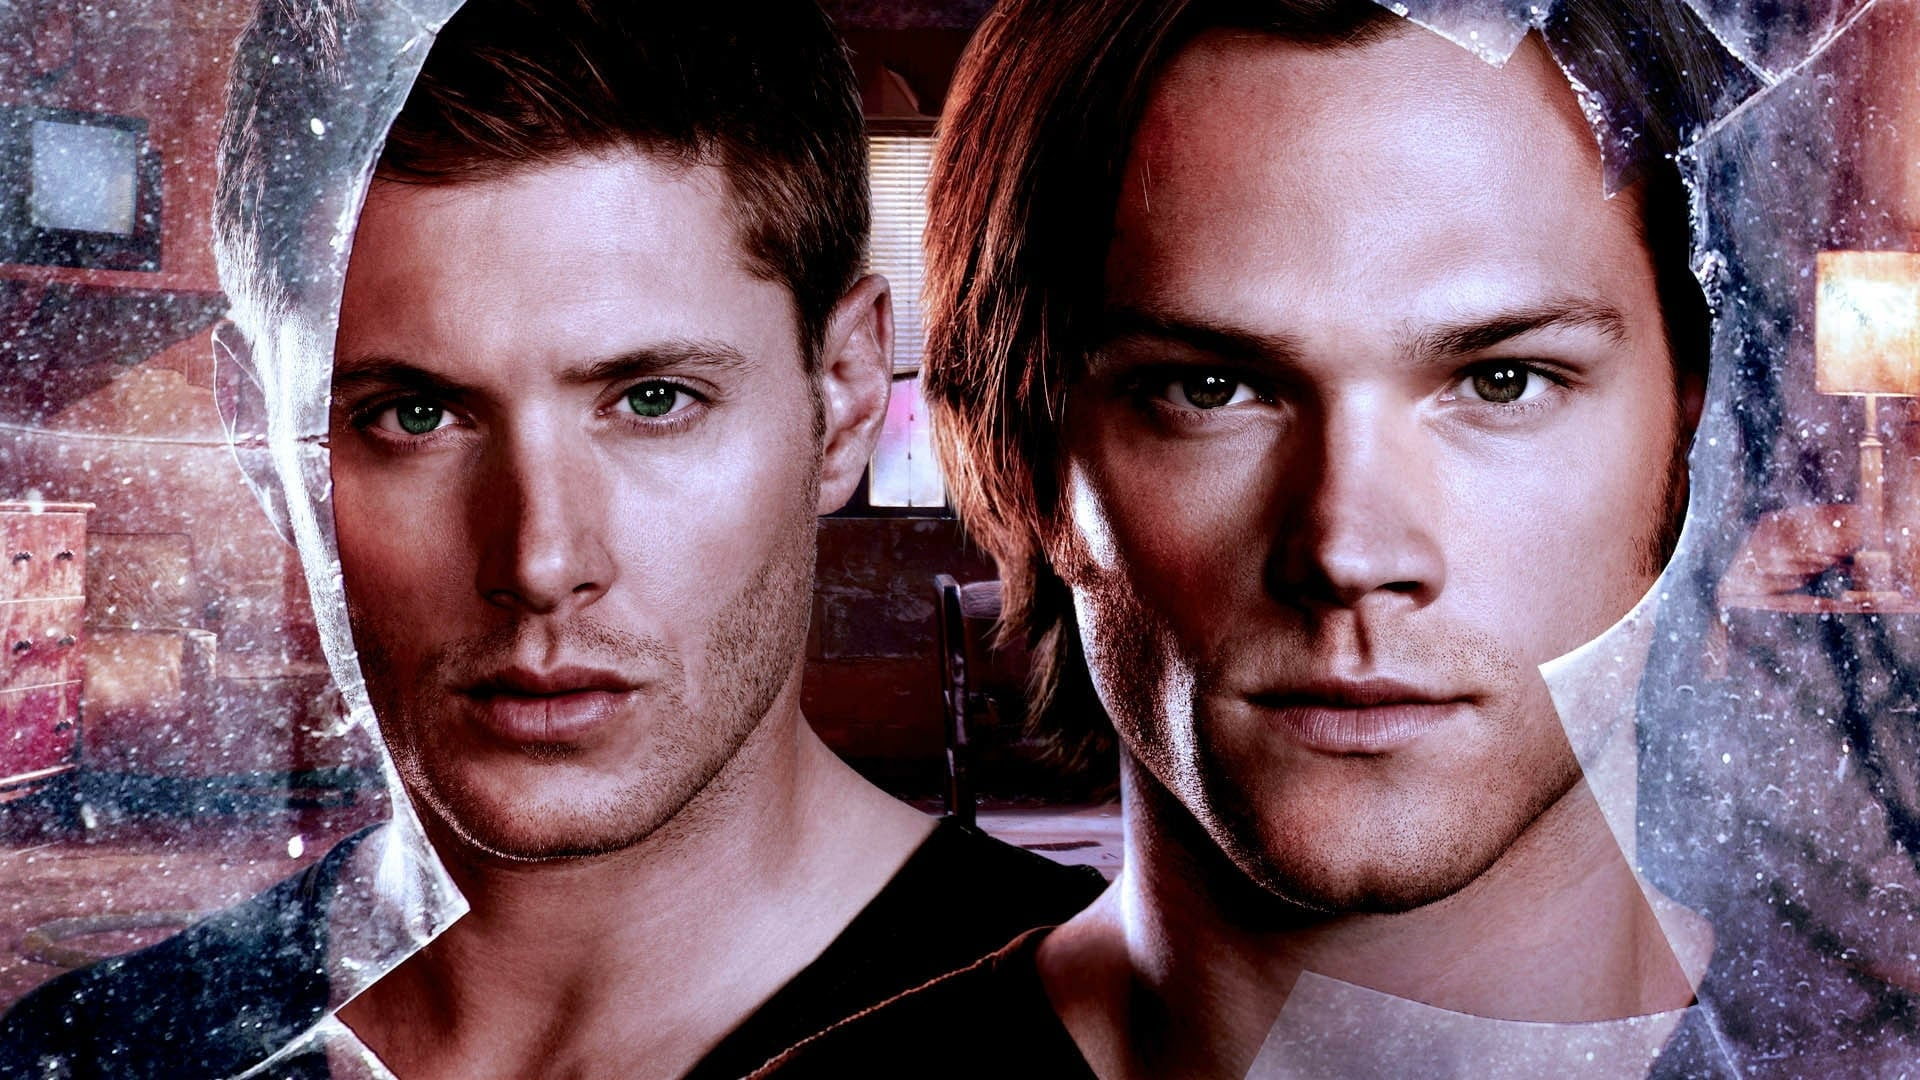 Supernatural - Season 4 Episode 21 When the Levee Breaks